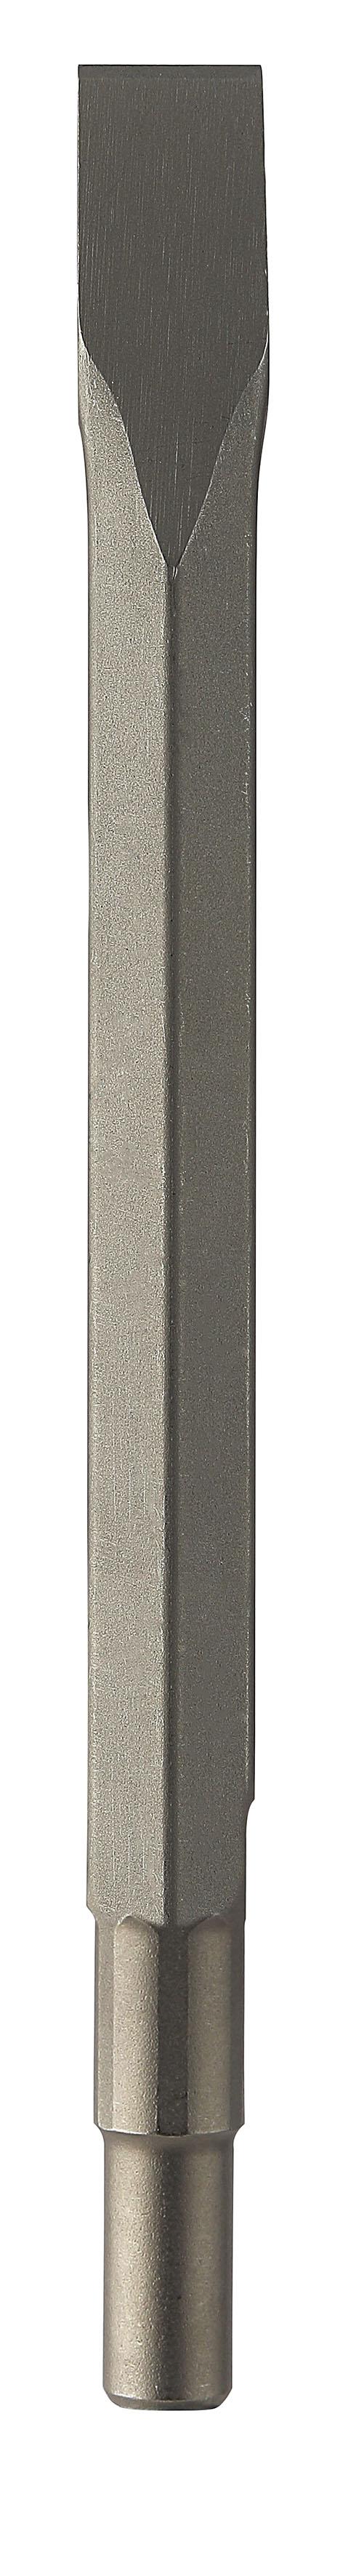 Perçage Burin Burin hexagonal 19 mm + extrémité cylindrique - 320.jpg